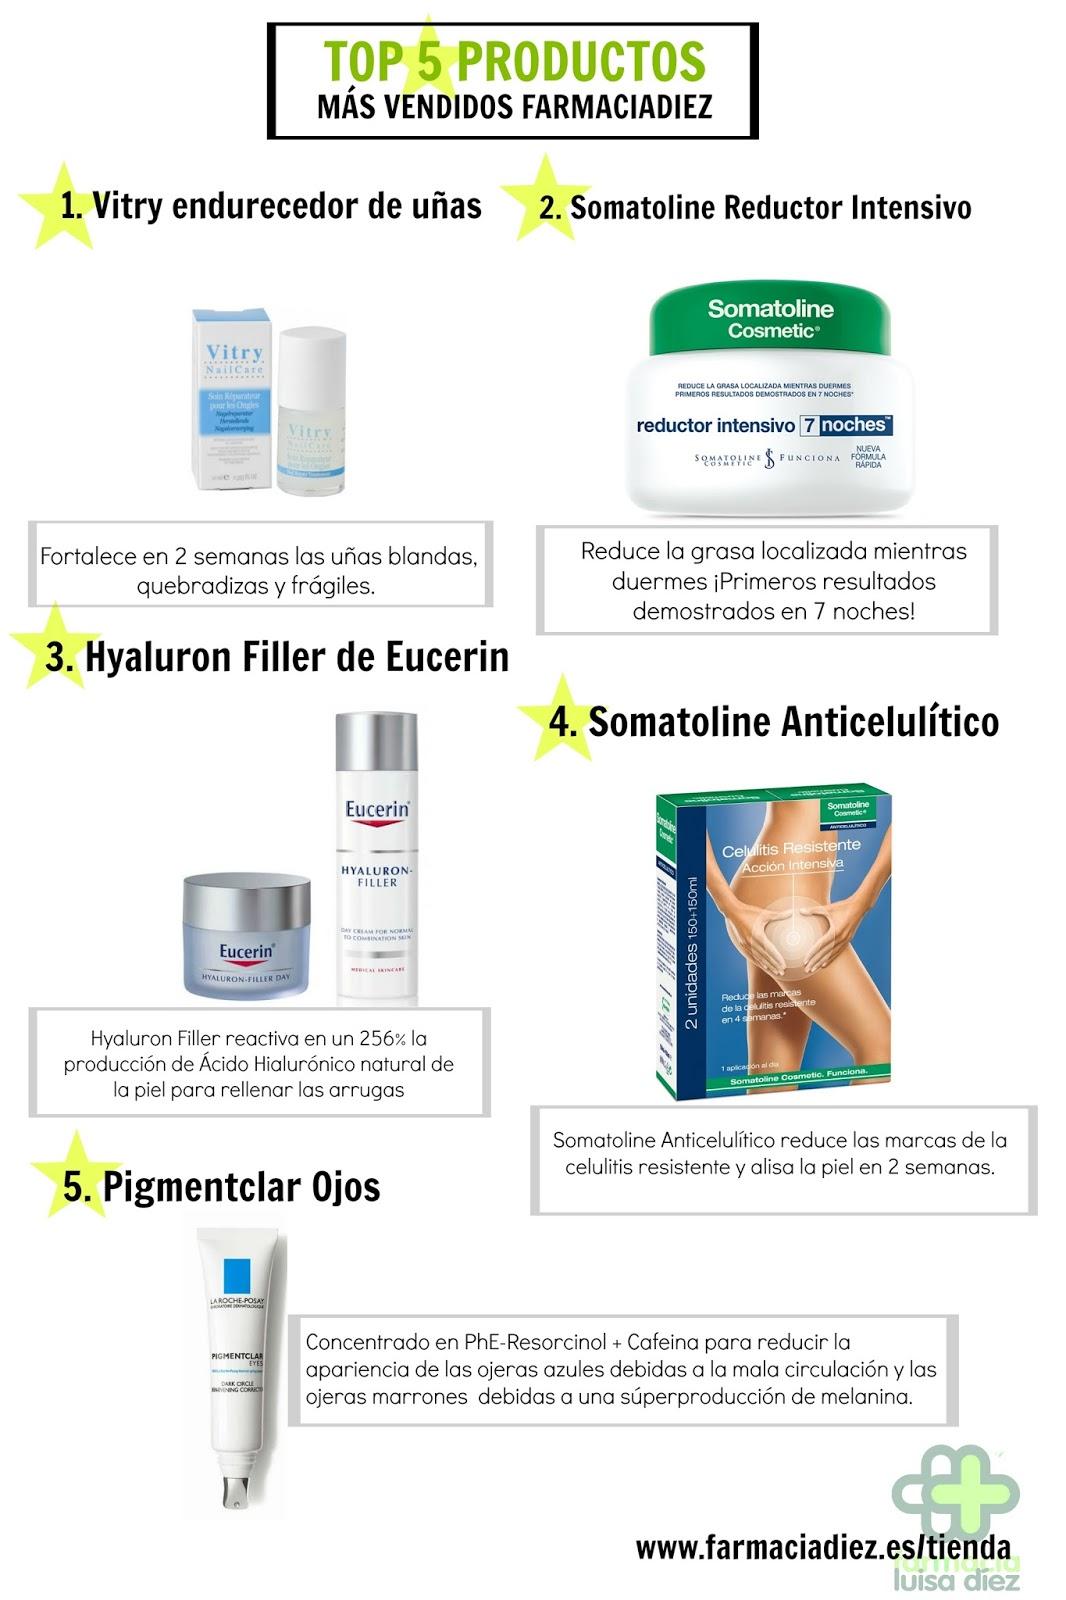 Productos m s vendidos en parafarmacia top 5 blog parafarmacia online farmacia d ez - Articulos mas vendidos ...